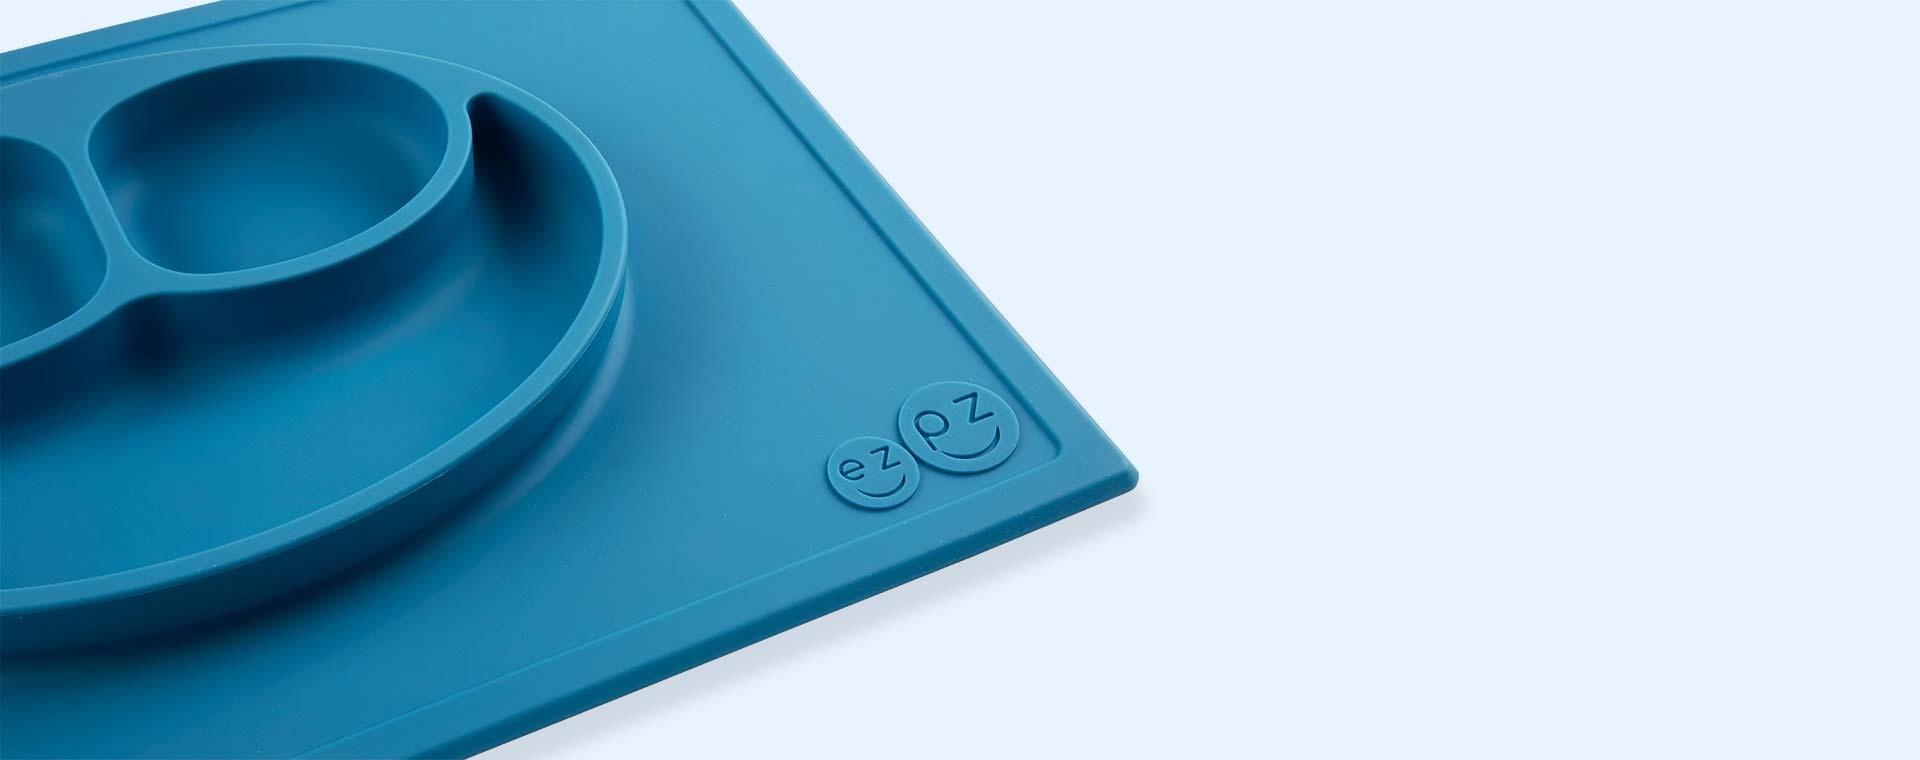 Buy The Ezpz Happy Mat At Kidly Eu